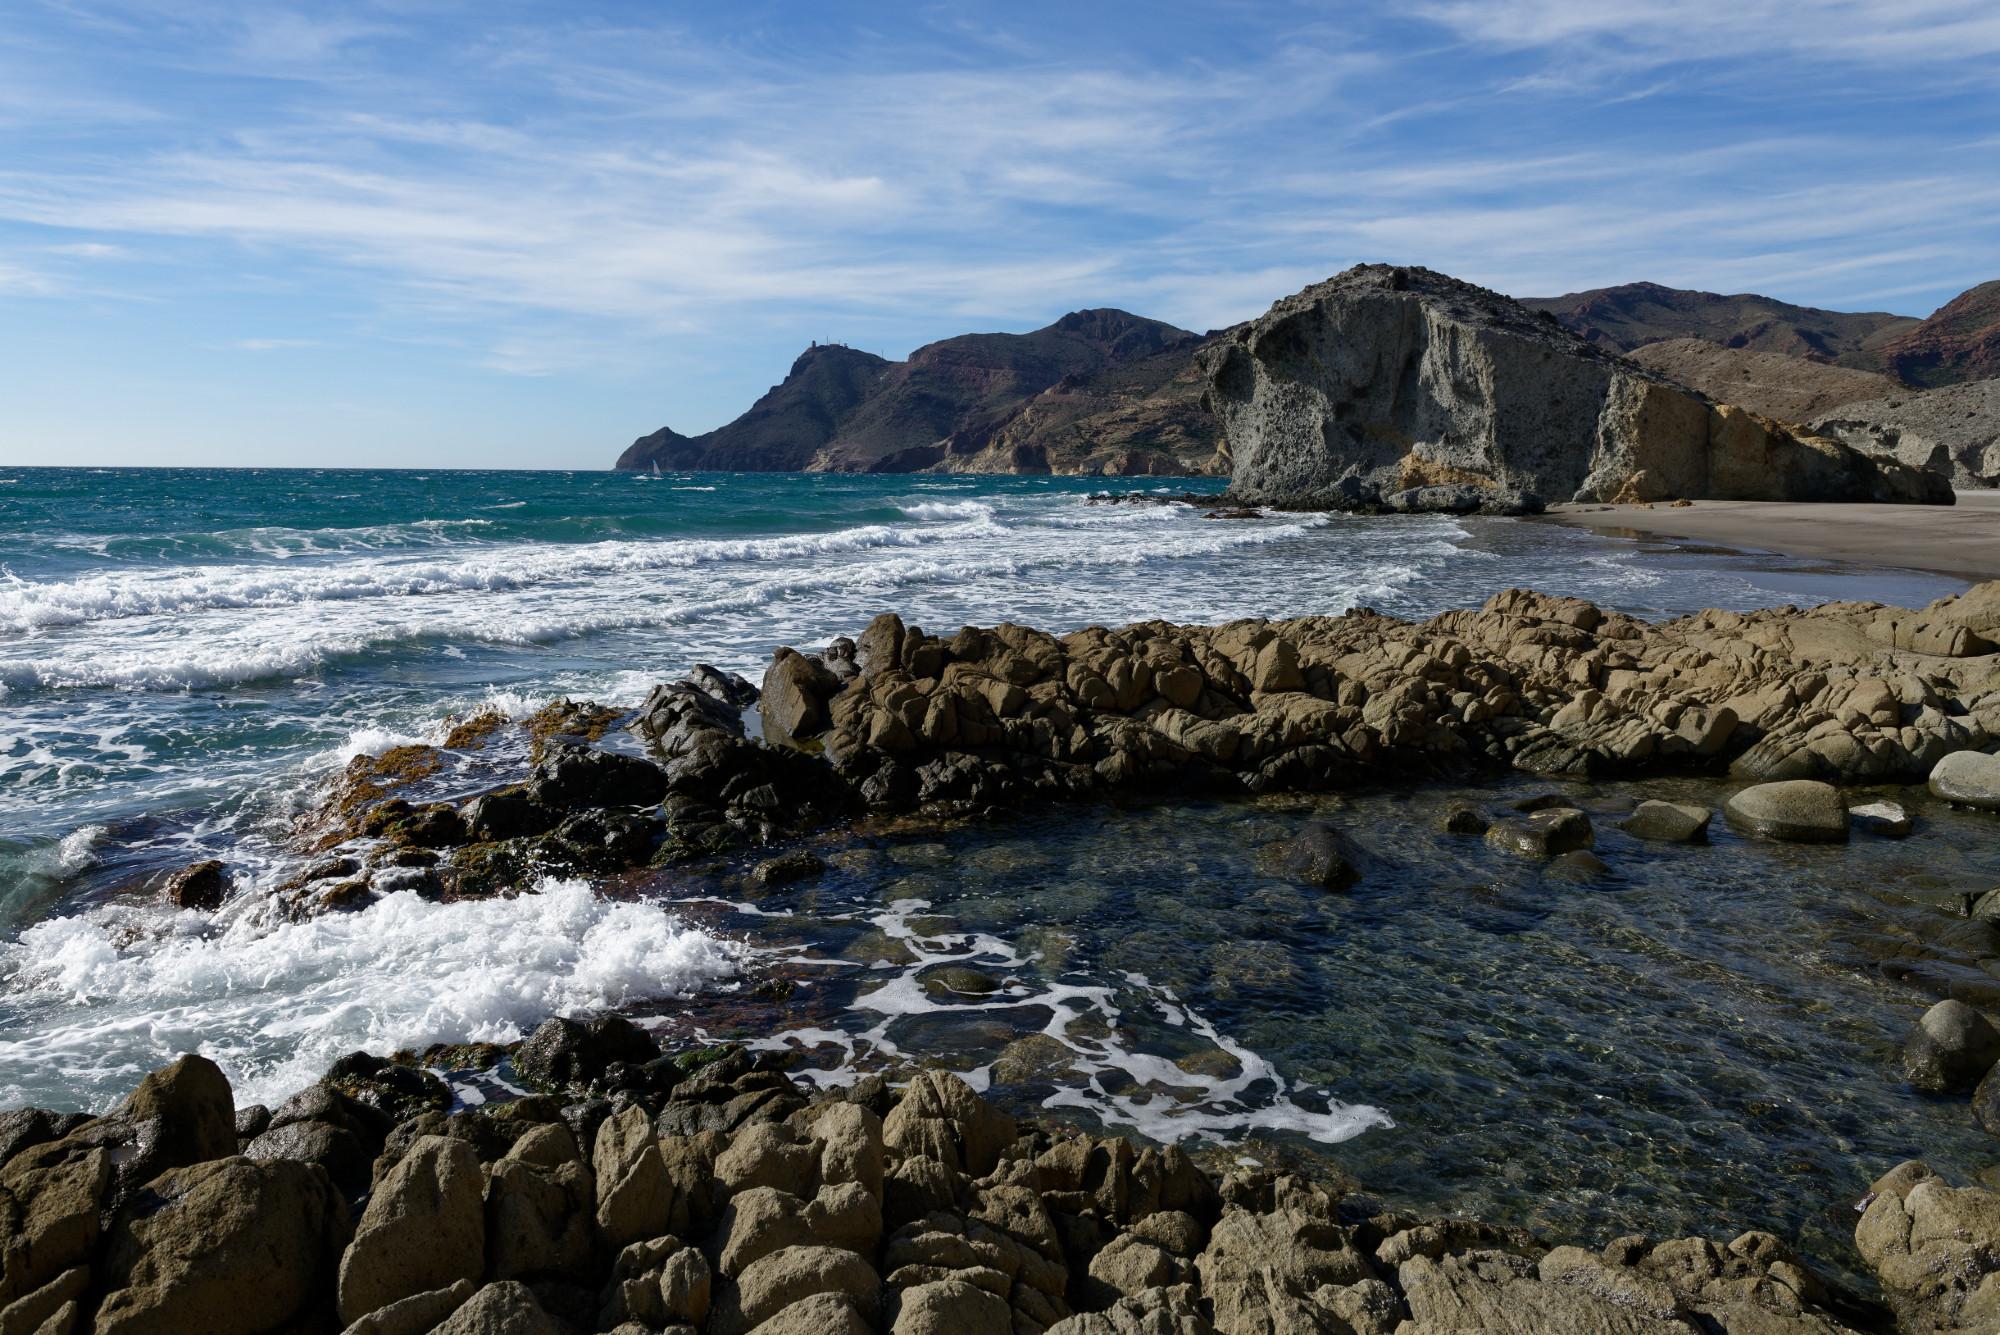 171214-San Jose-Playa del Monsul (Cabo de Gata-Andalousie) (190)